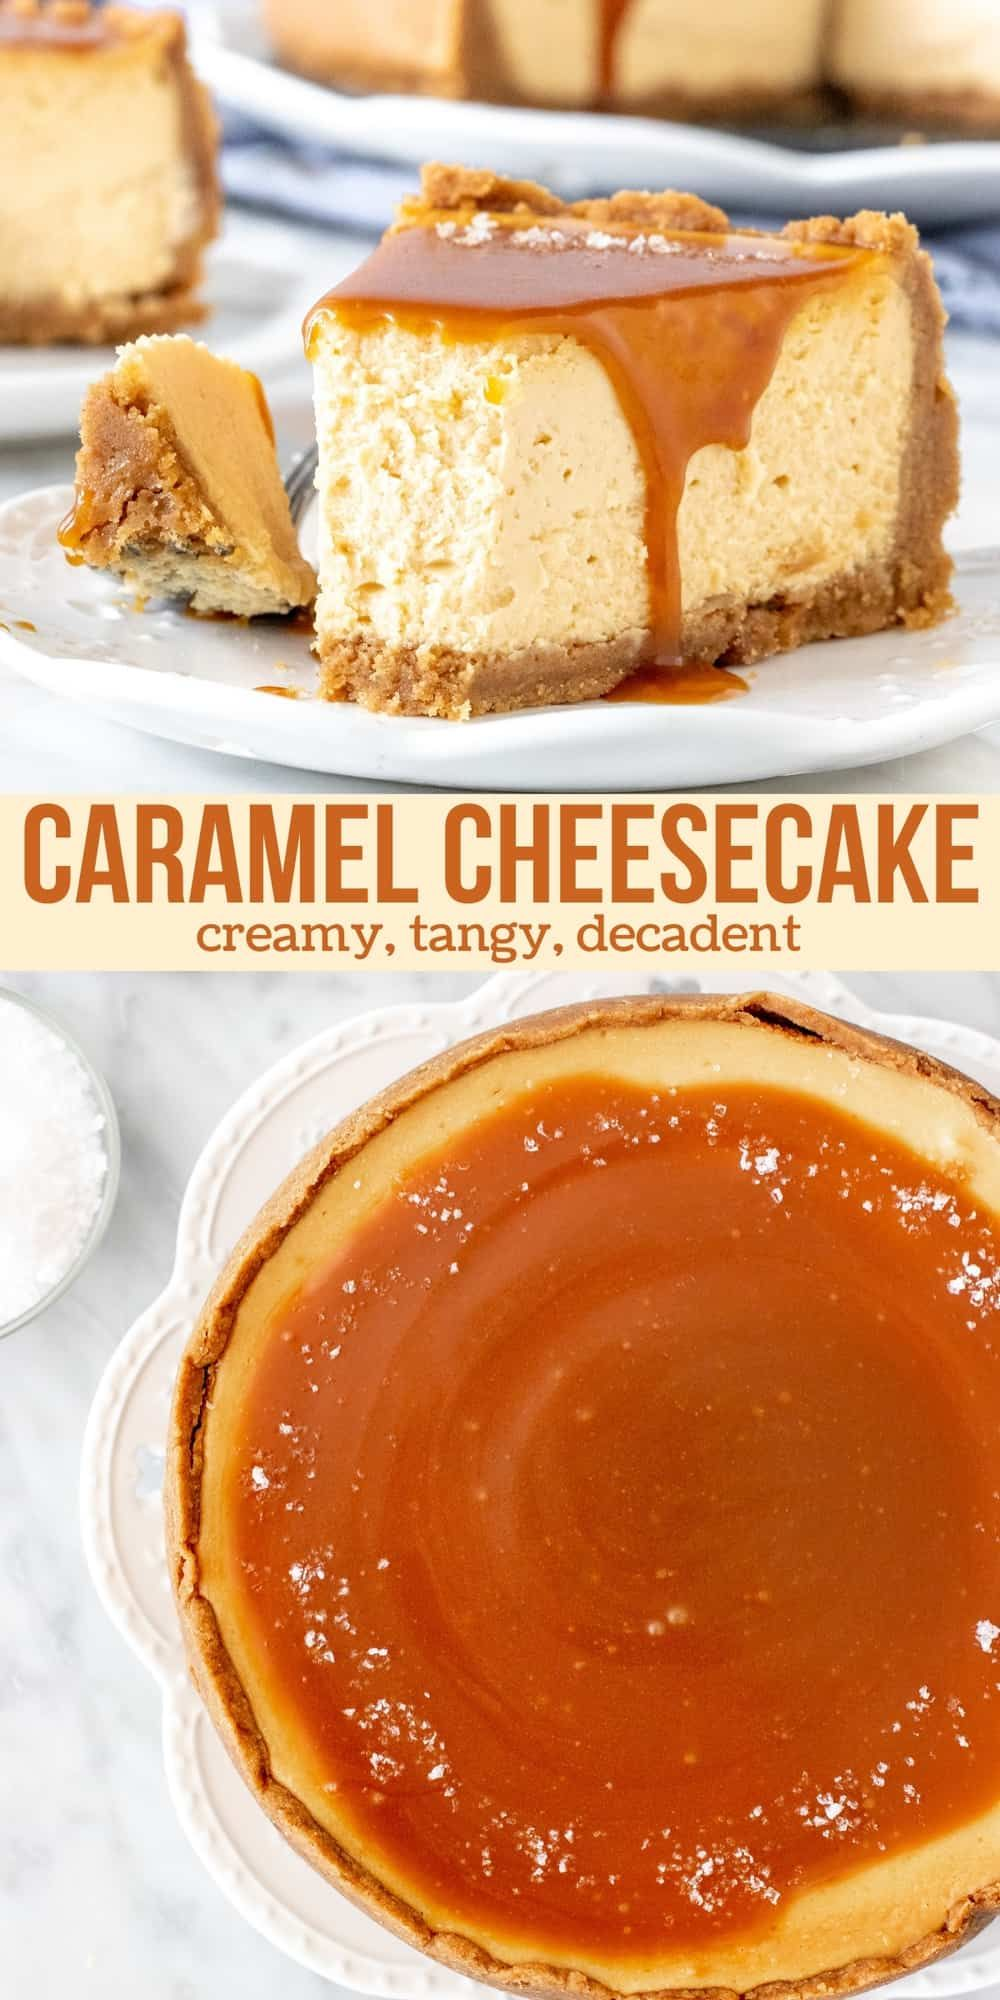 Caramel Cheesecake Recipe In 2021 Easy Cheesecake Recipes Caramel Cheesecake Caramel Cheesecake Recipes